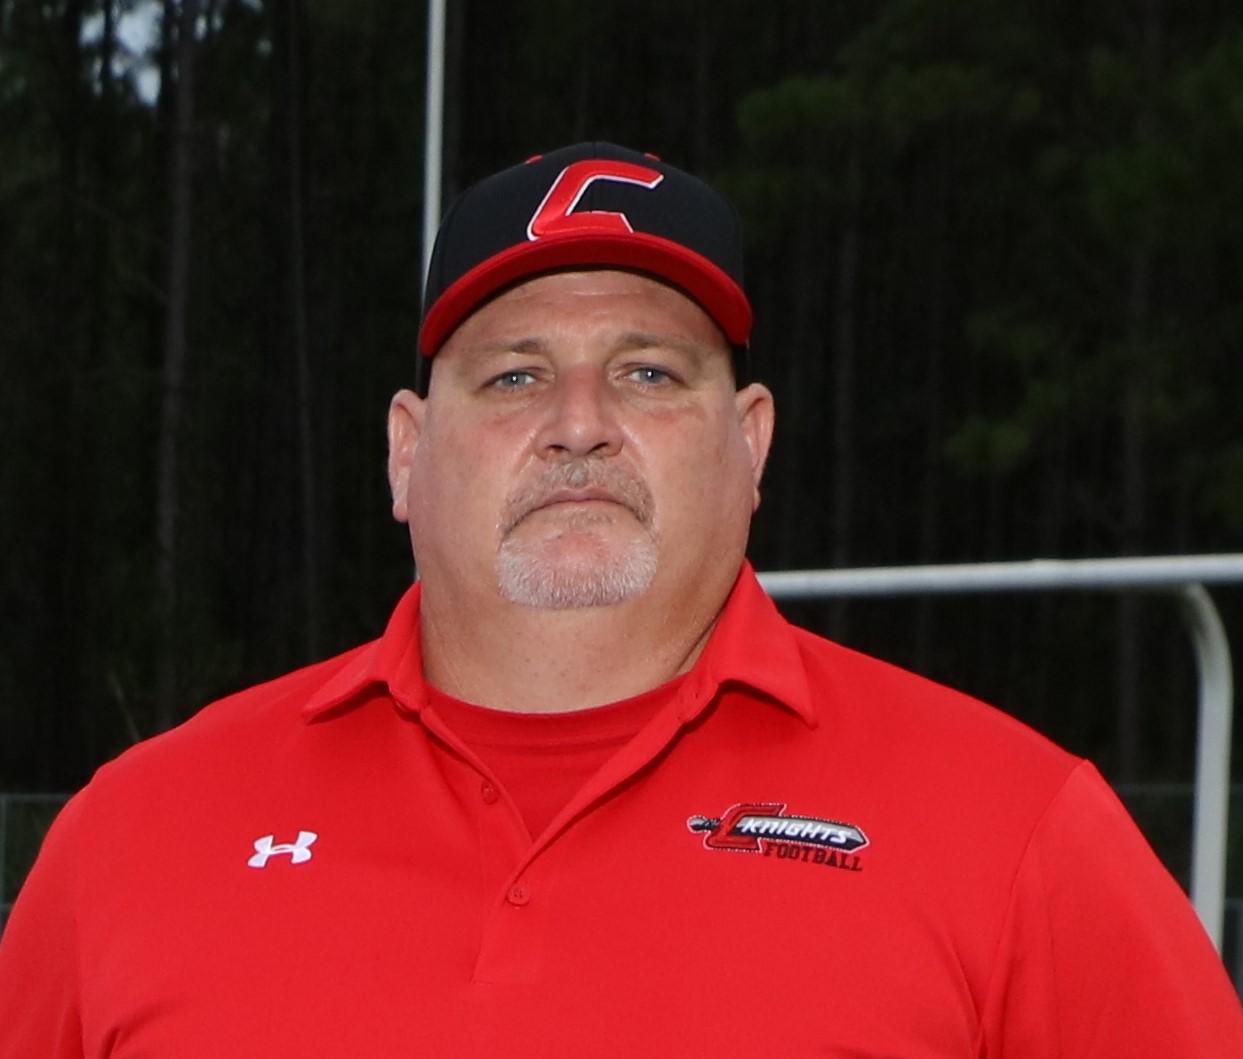 Coach Bowers